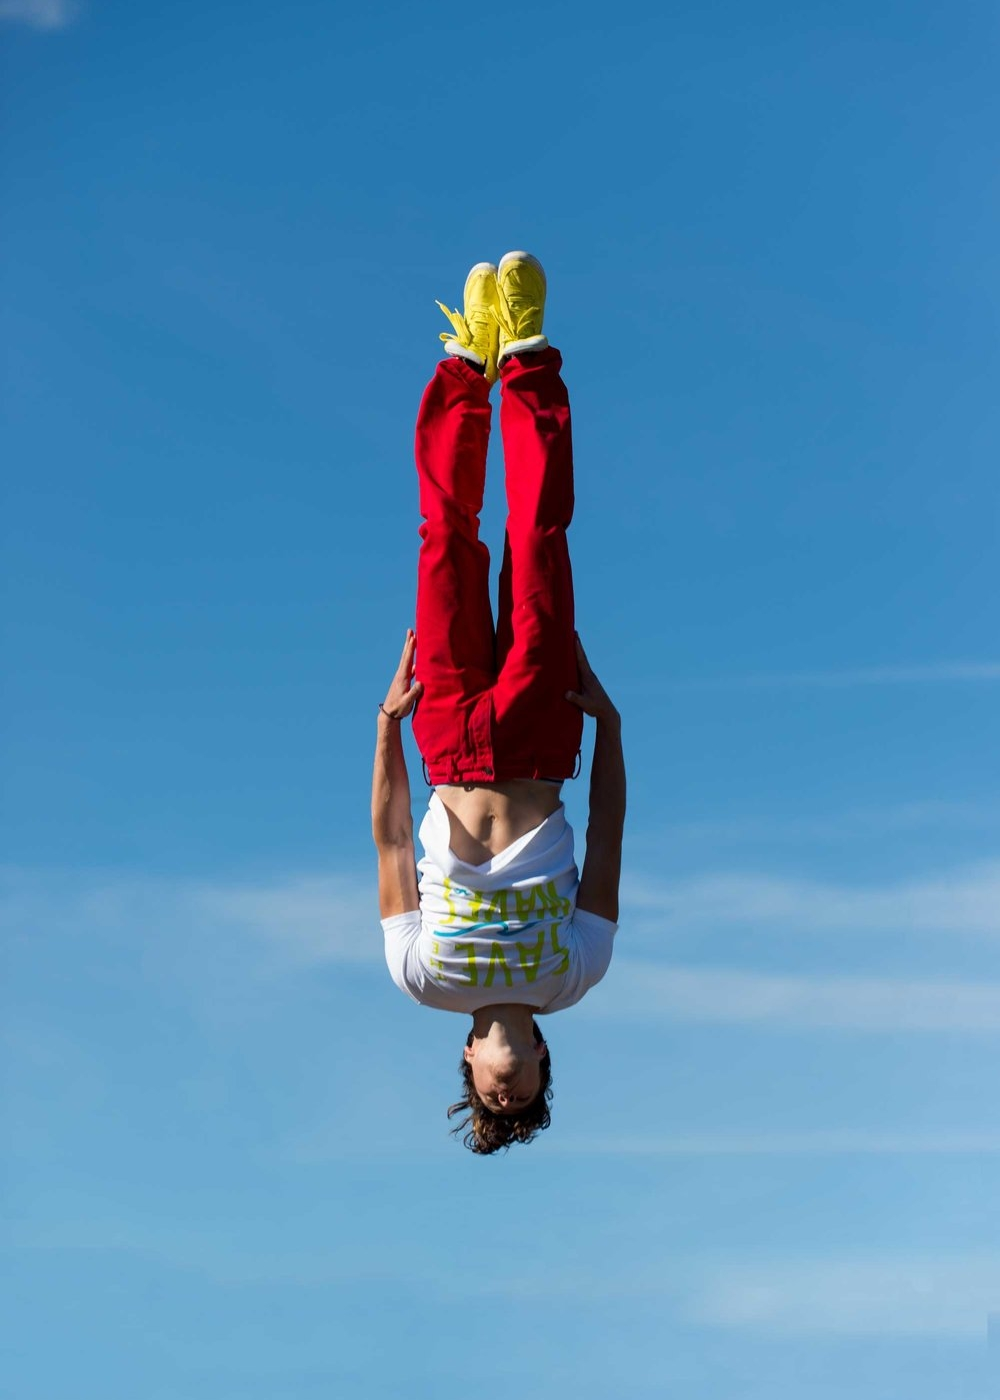 Dennys-Mamero-Jump-Upsidedown.jpg